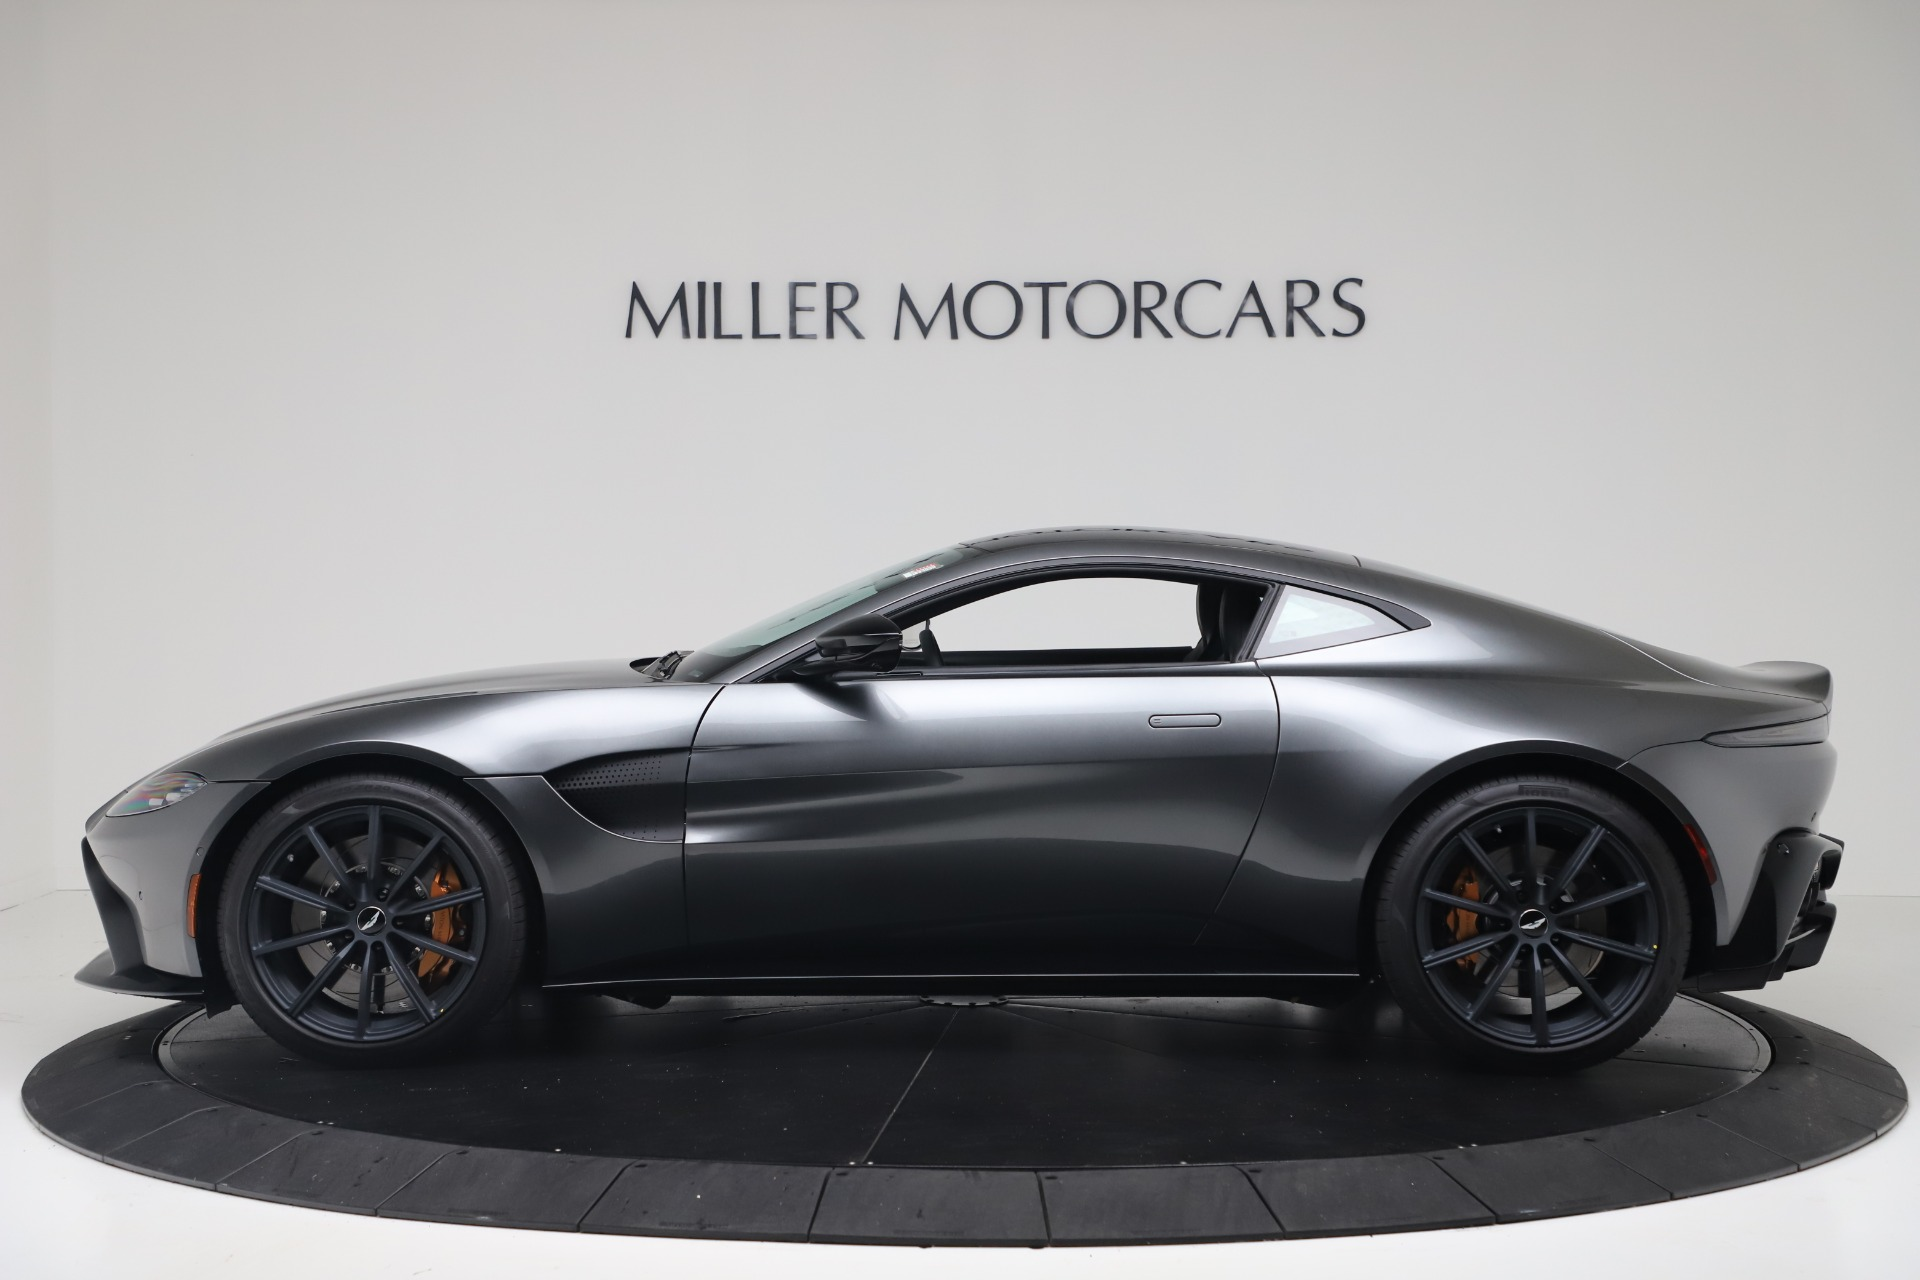 New 2020 Aston Martin Vantage V8 For Sale In Greenwich, CT 3408_p4